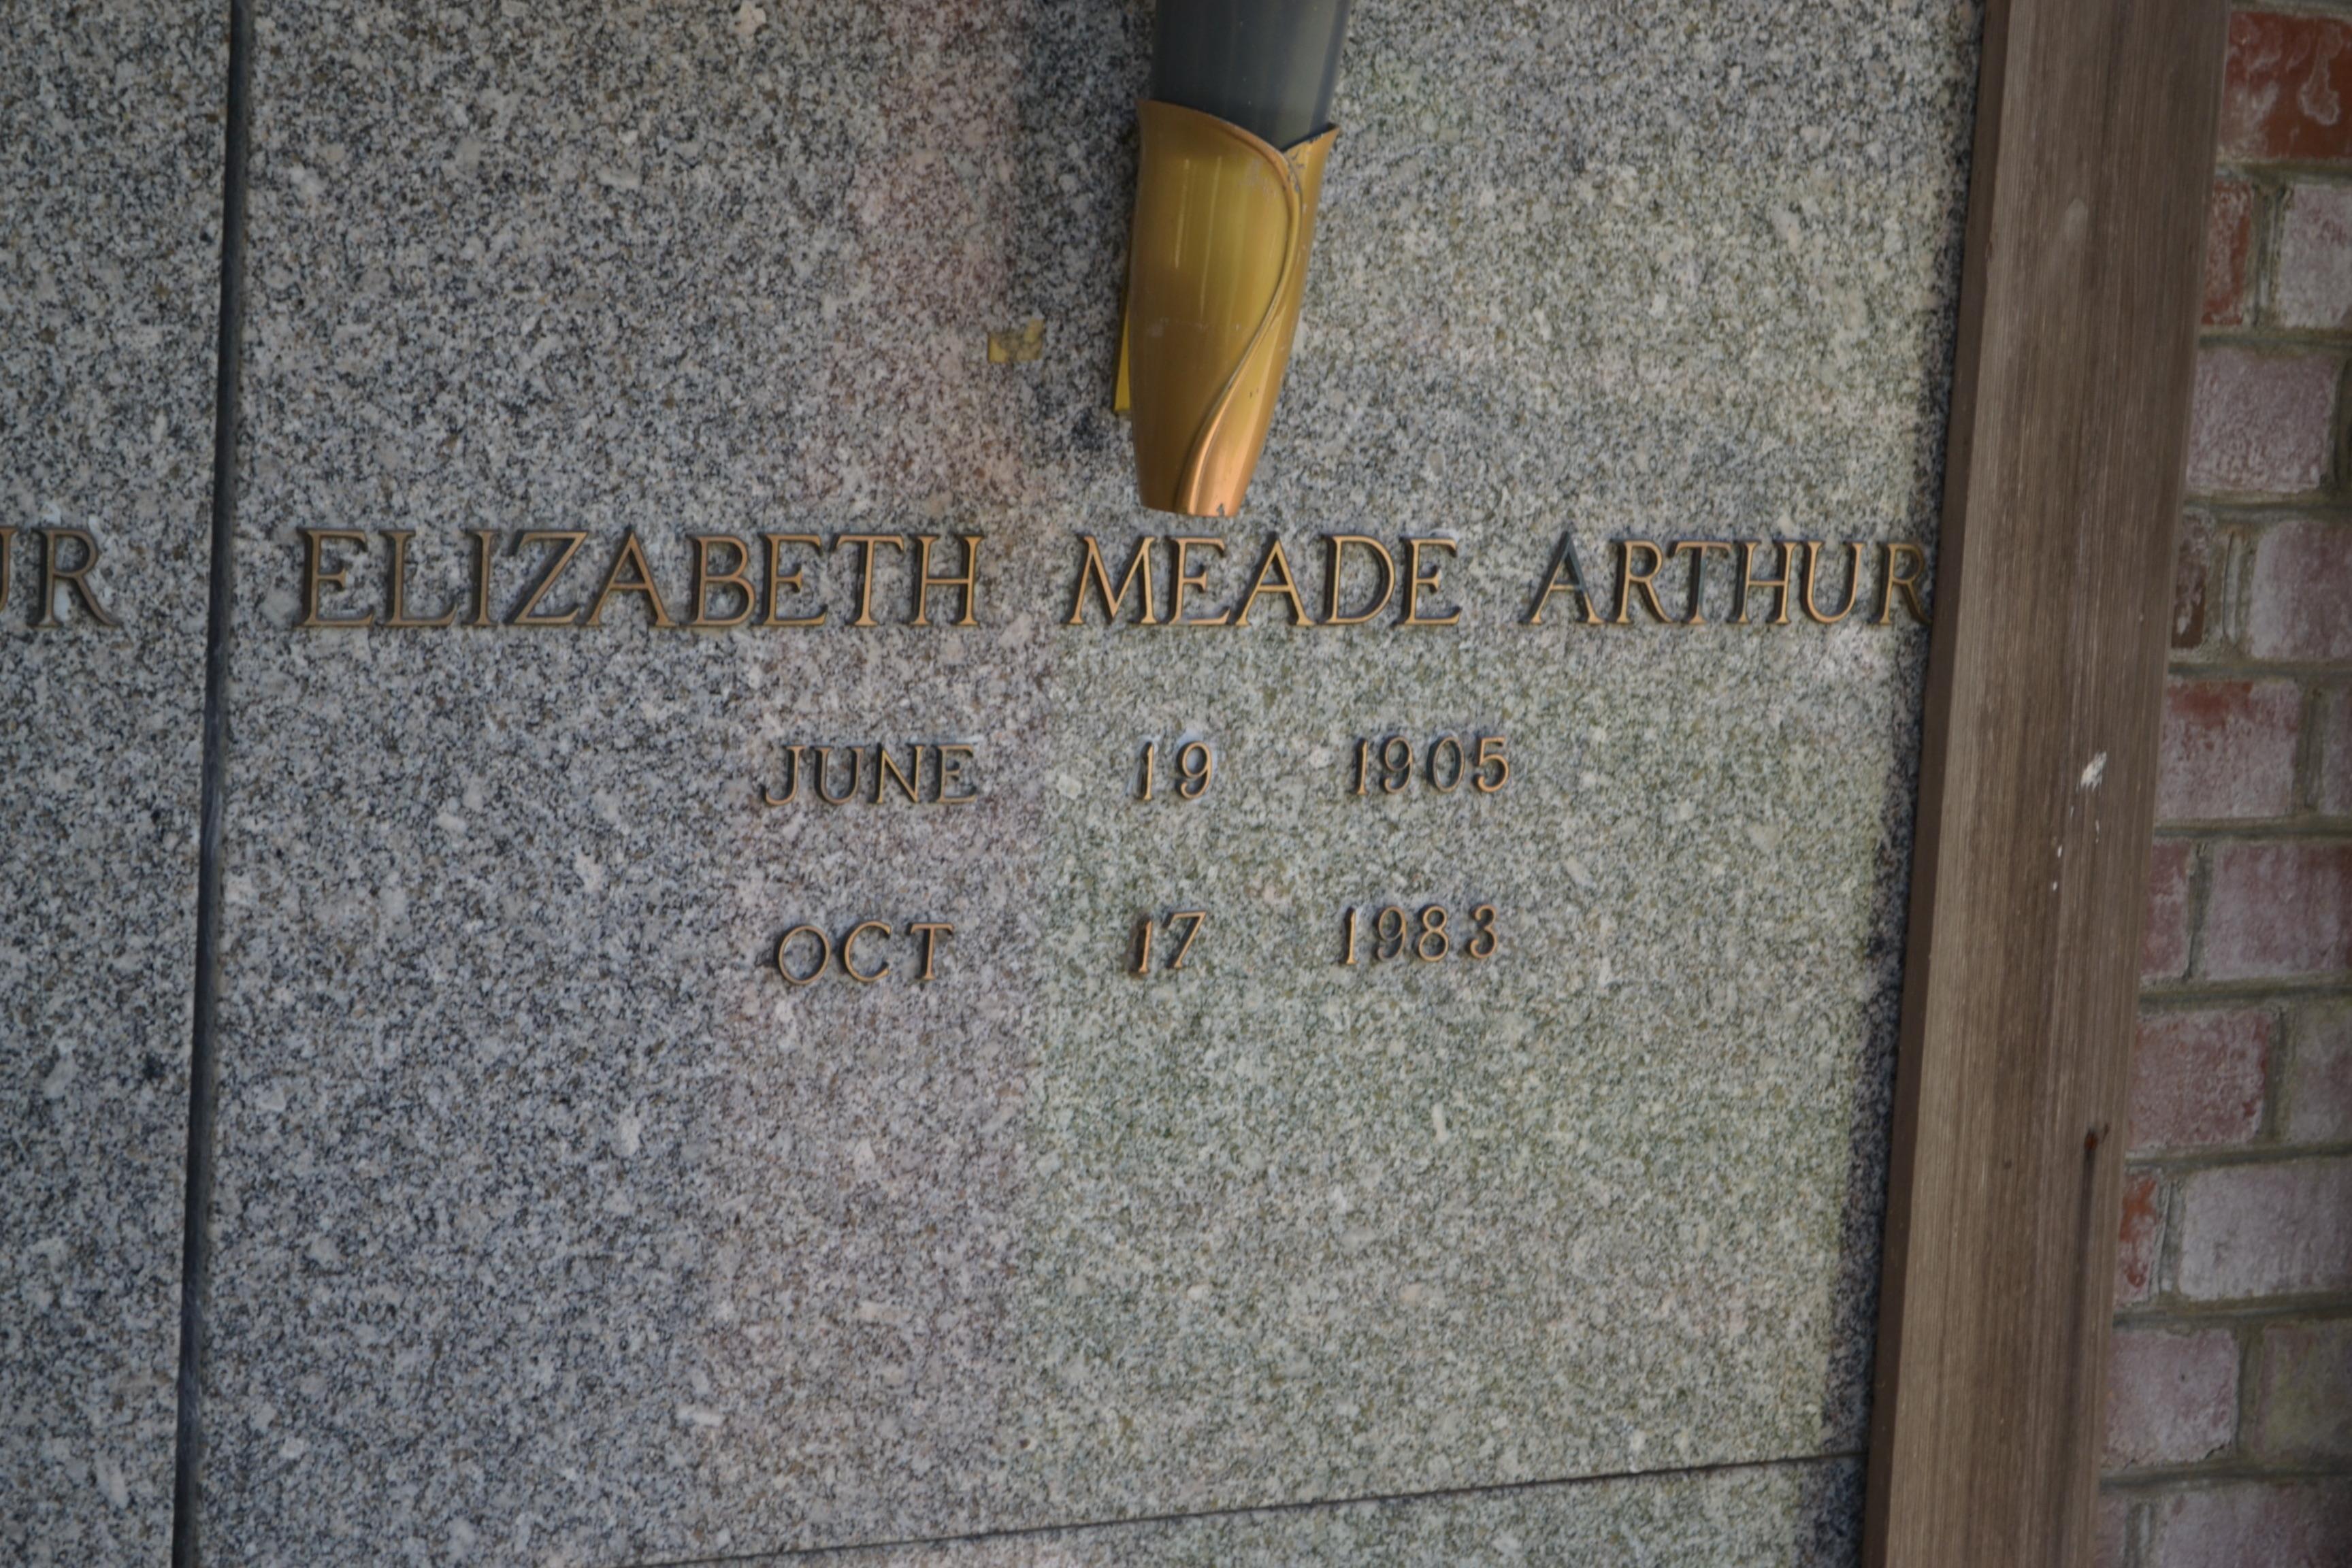 Elizabeth <i>Meade</i> Arthur